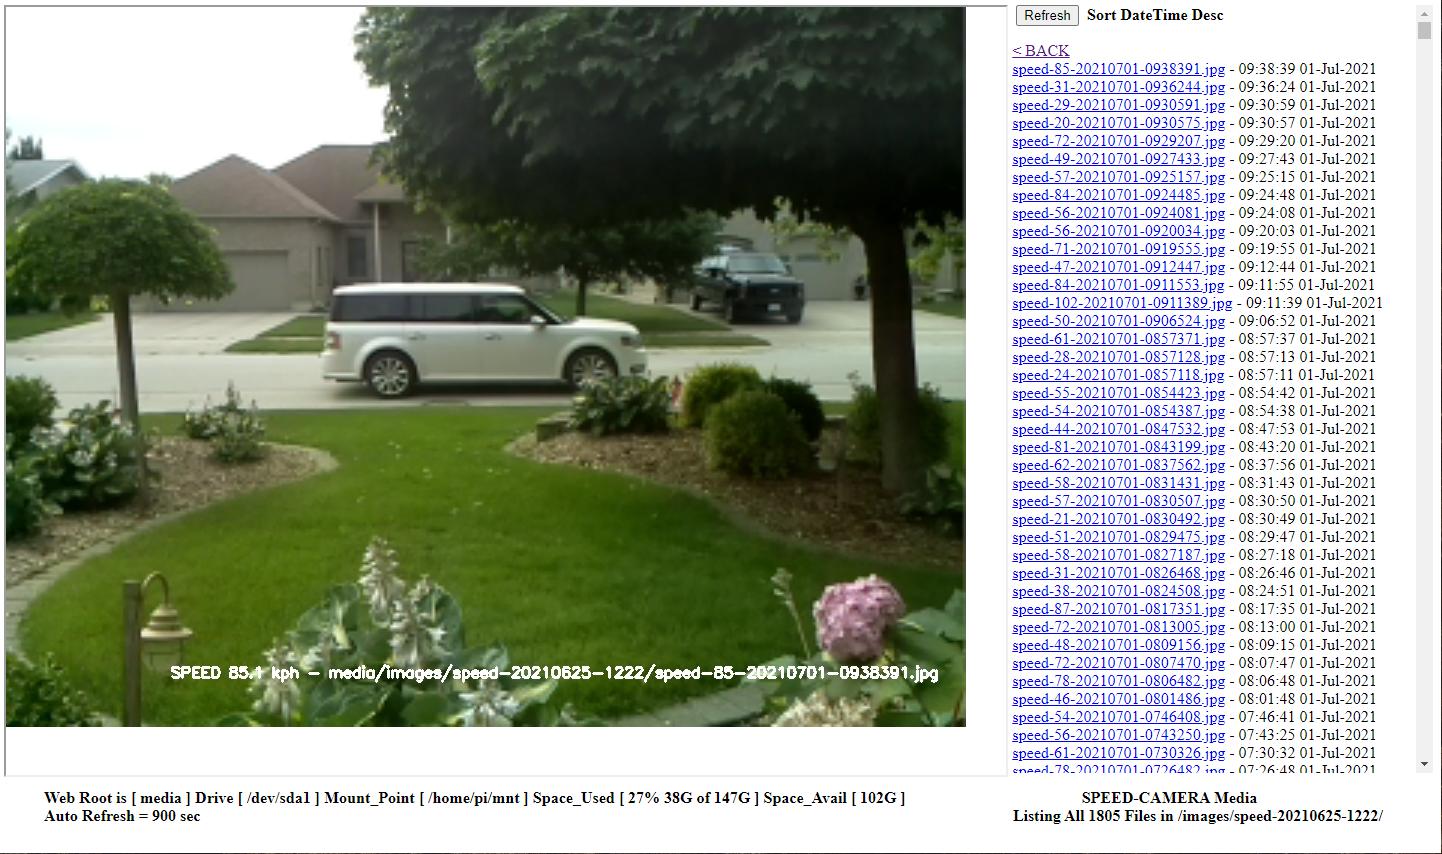 Speed Camera IMAGES Folder Web Page